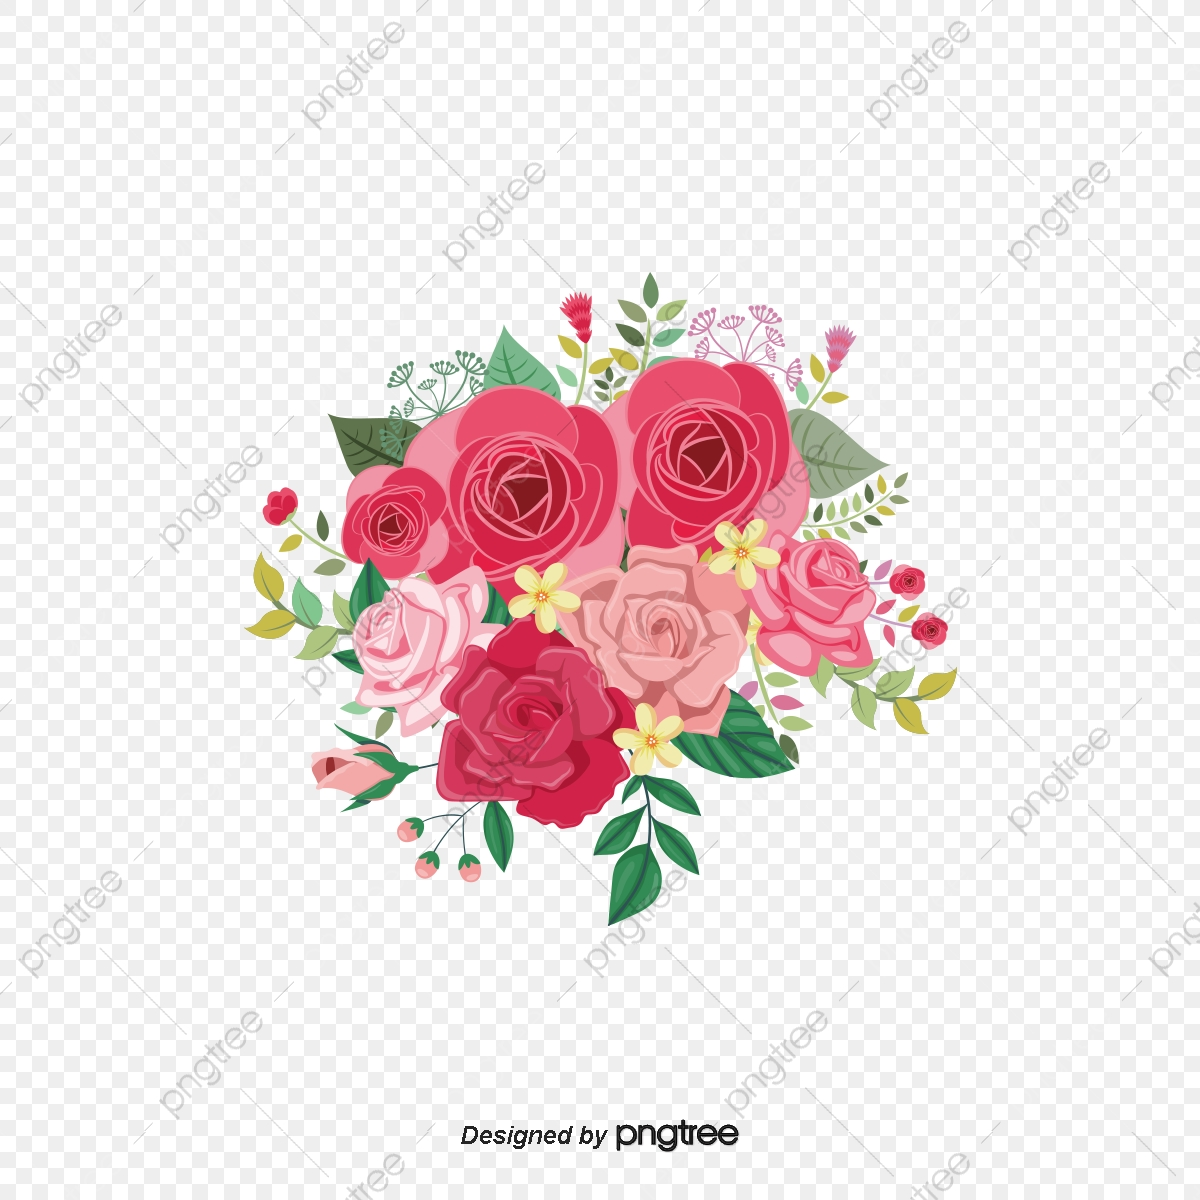 Bunga Gambar Hiasan Vektor Bunga Ilustrasi Corak Bunga Unsur Unsur